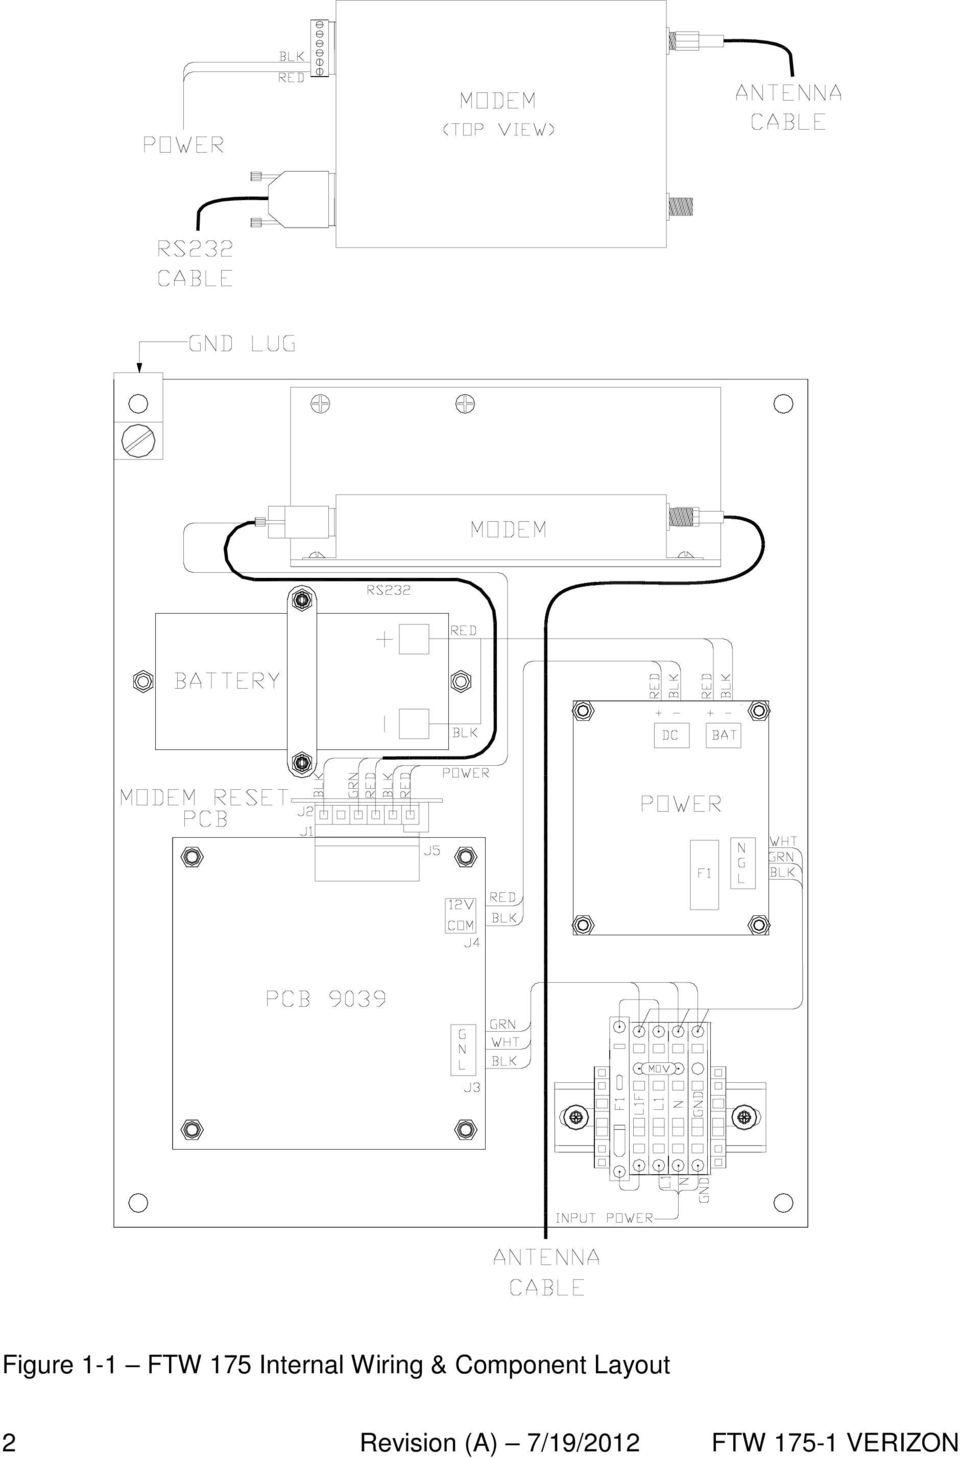 FTW 175 VERIZON Wireless Monitoring System Reference Manual Part Number VERIZON  PDF